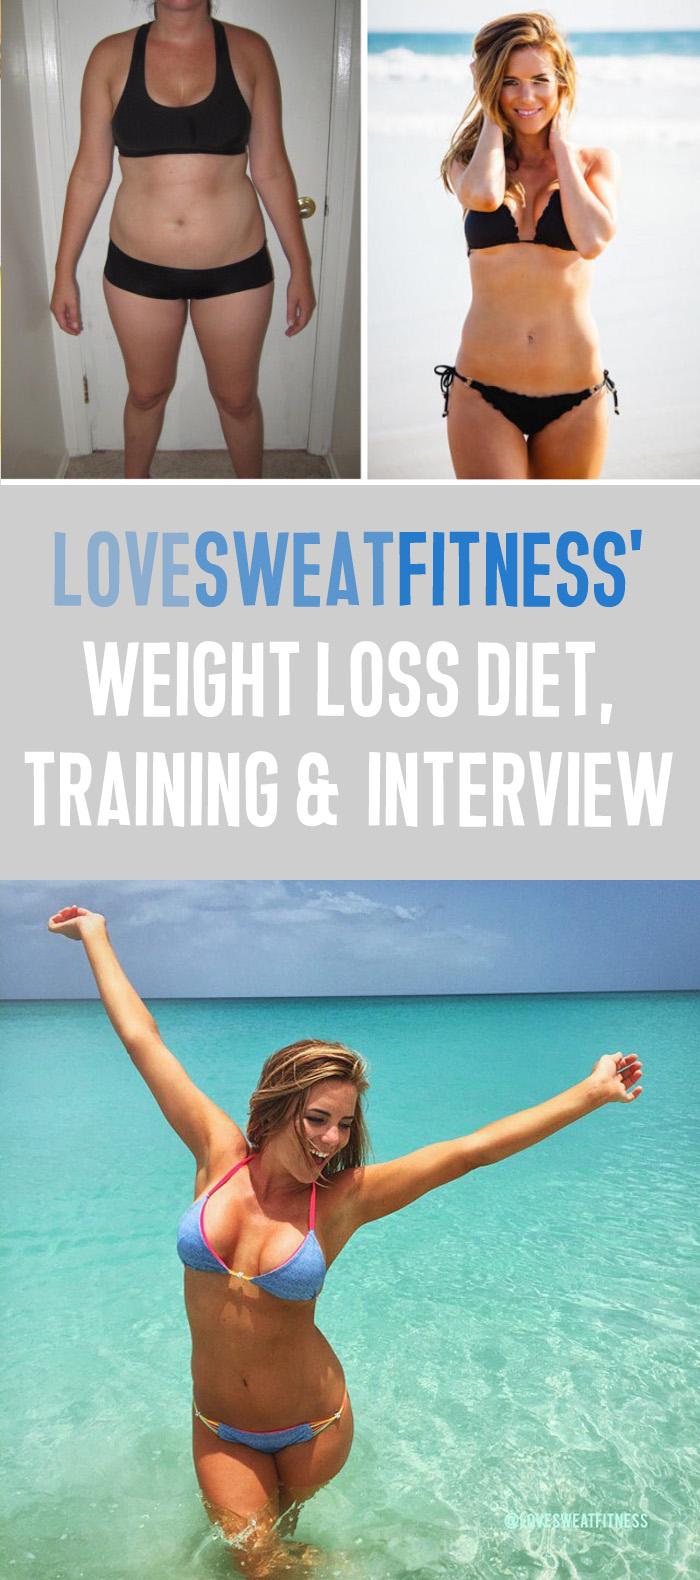 katie-dunlop-lovesweatfitness-weight-loss